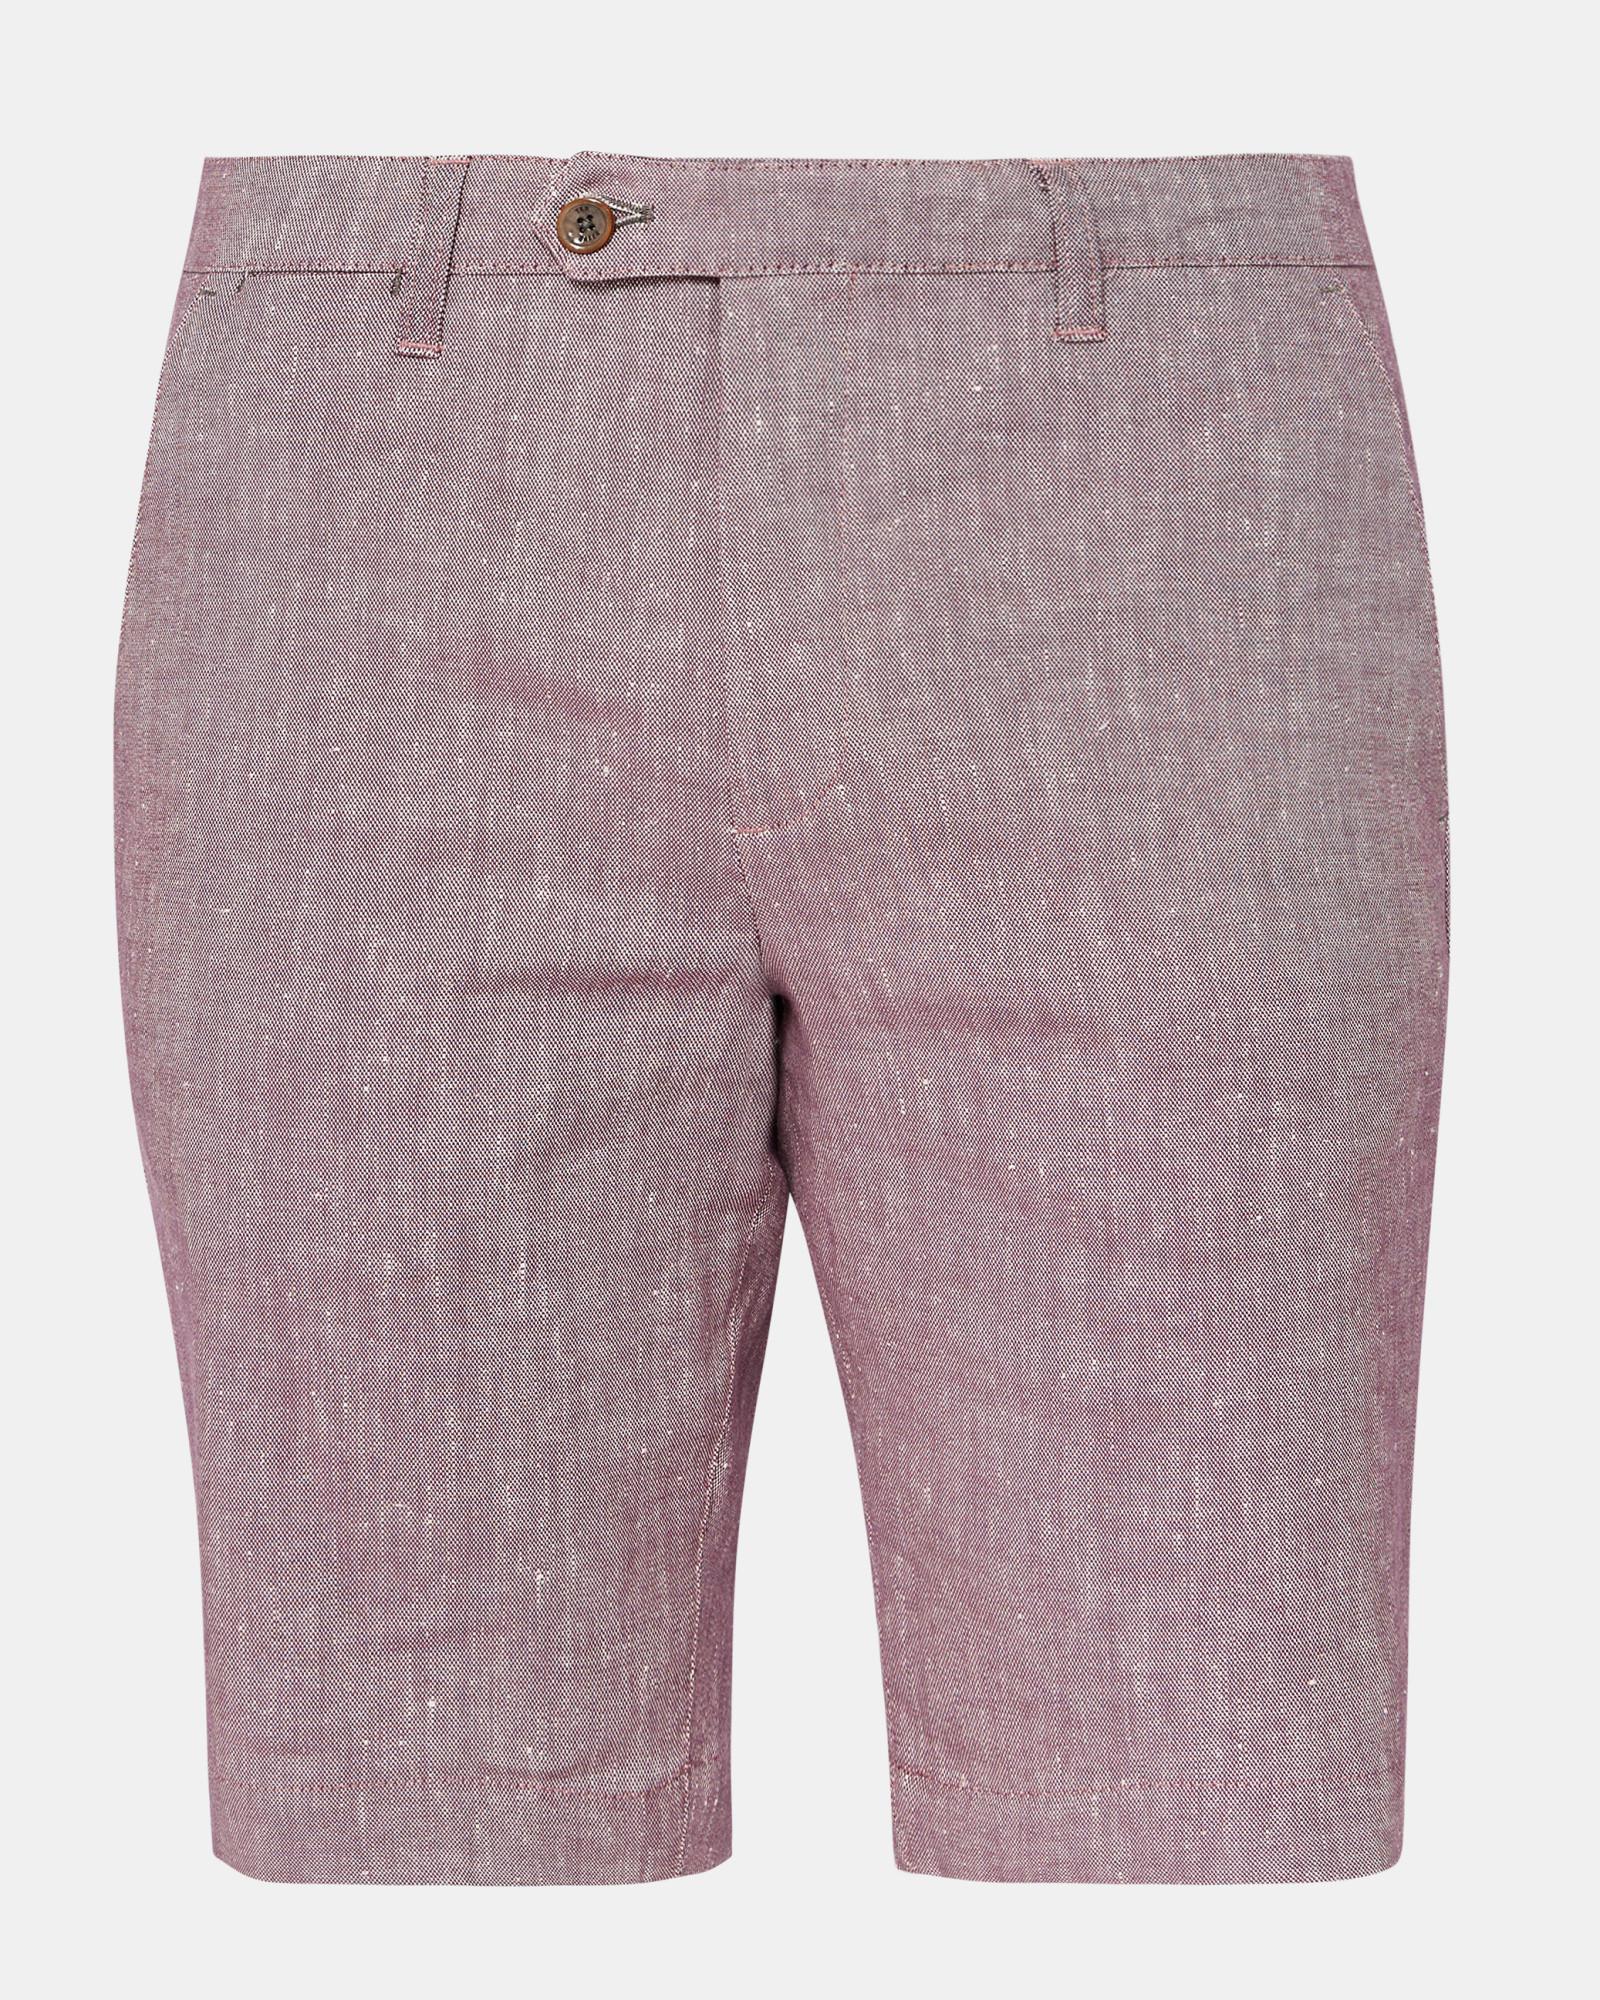 Slim Fit Linen Shorts Ted Baker RemUbcS9ov